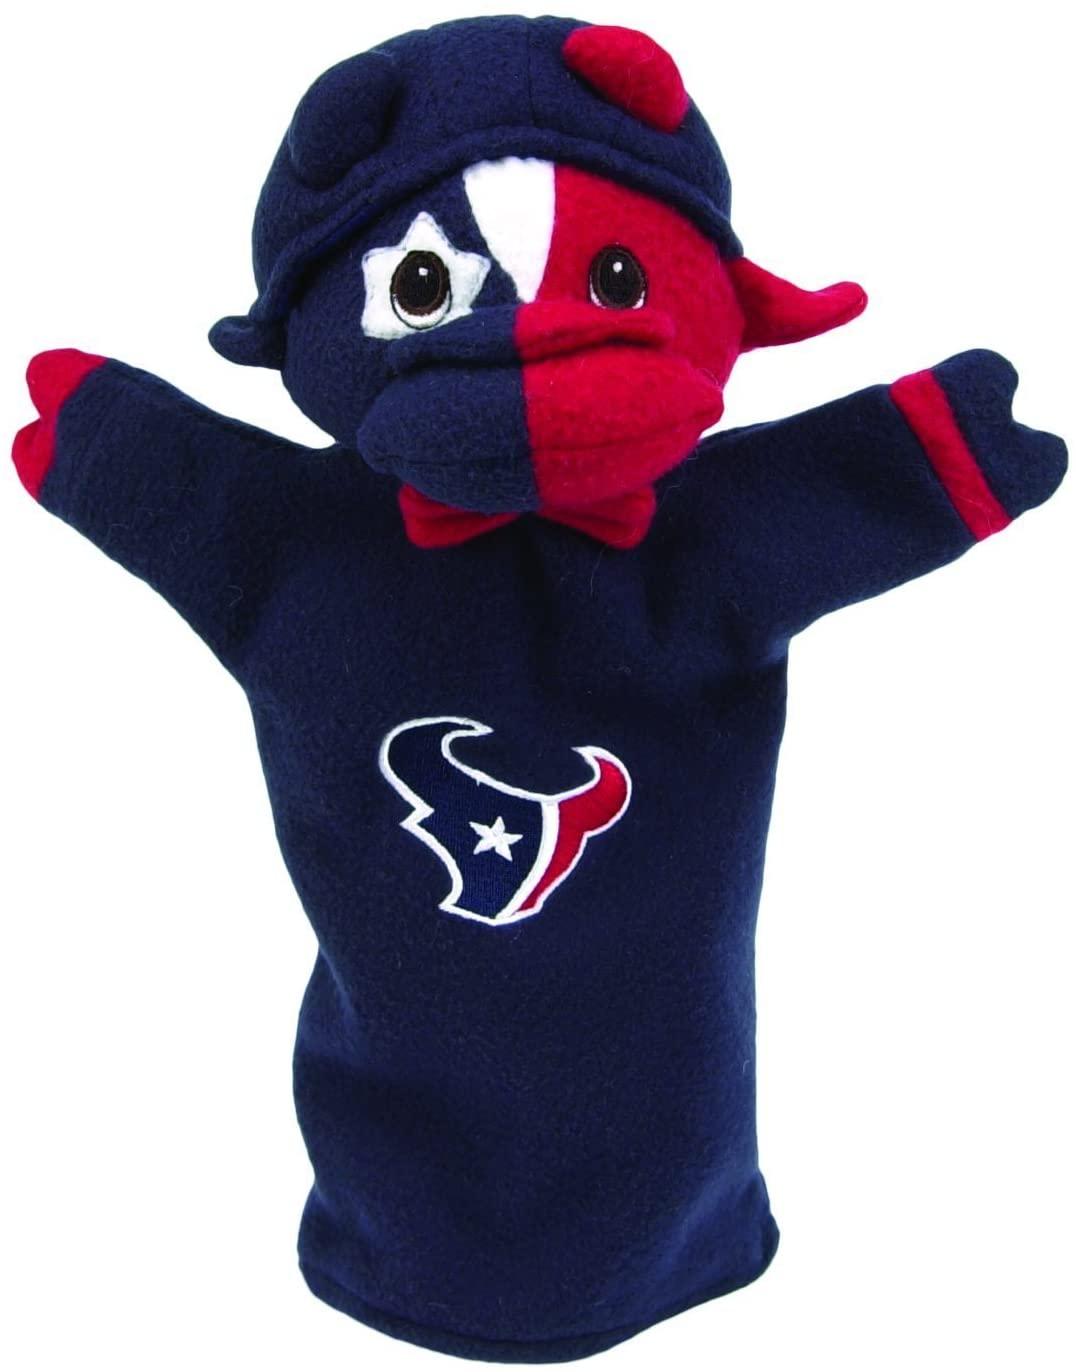 Houston Texans Mascot Hand Puppet